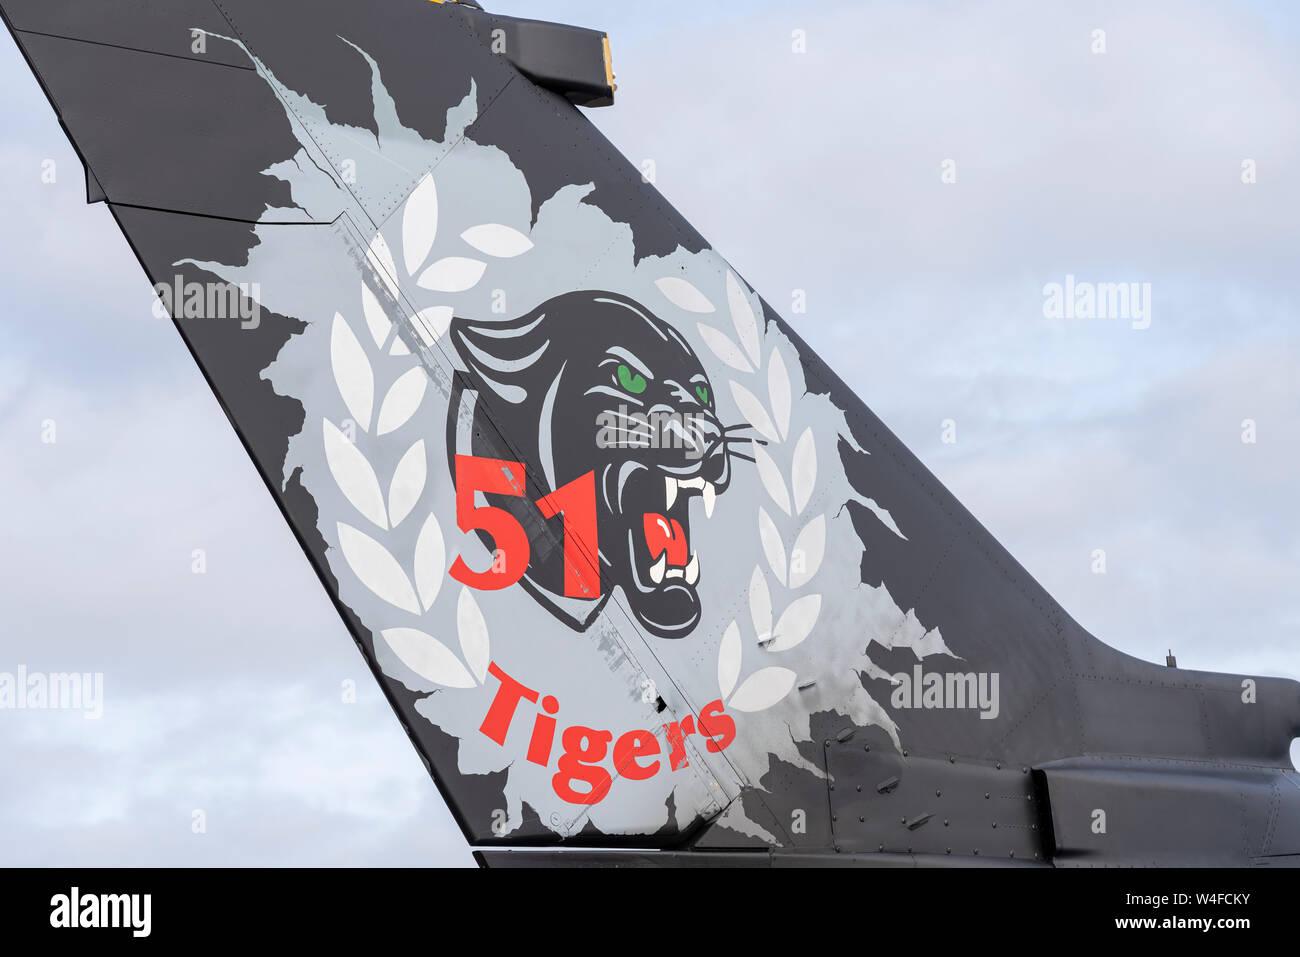 german air force logo